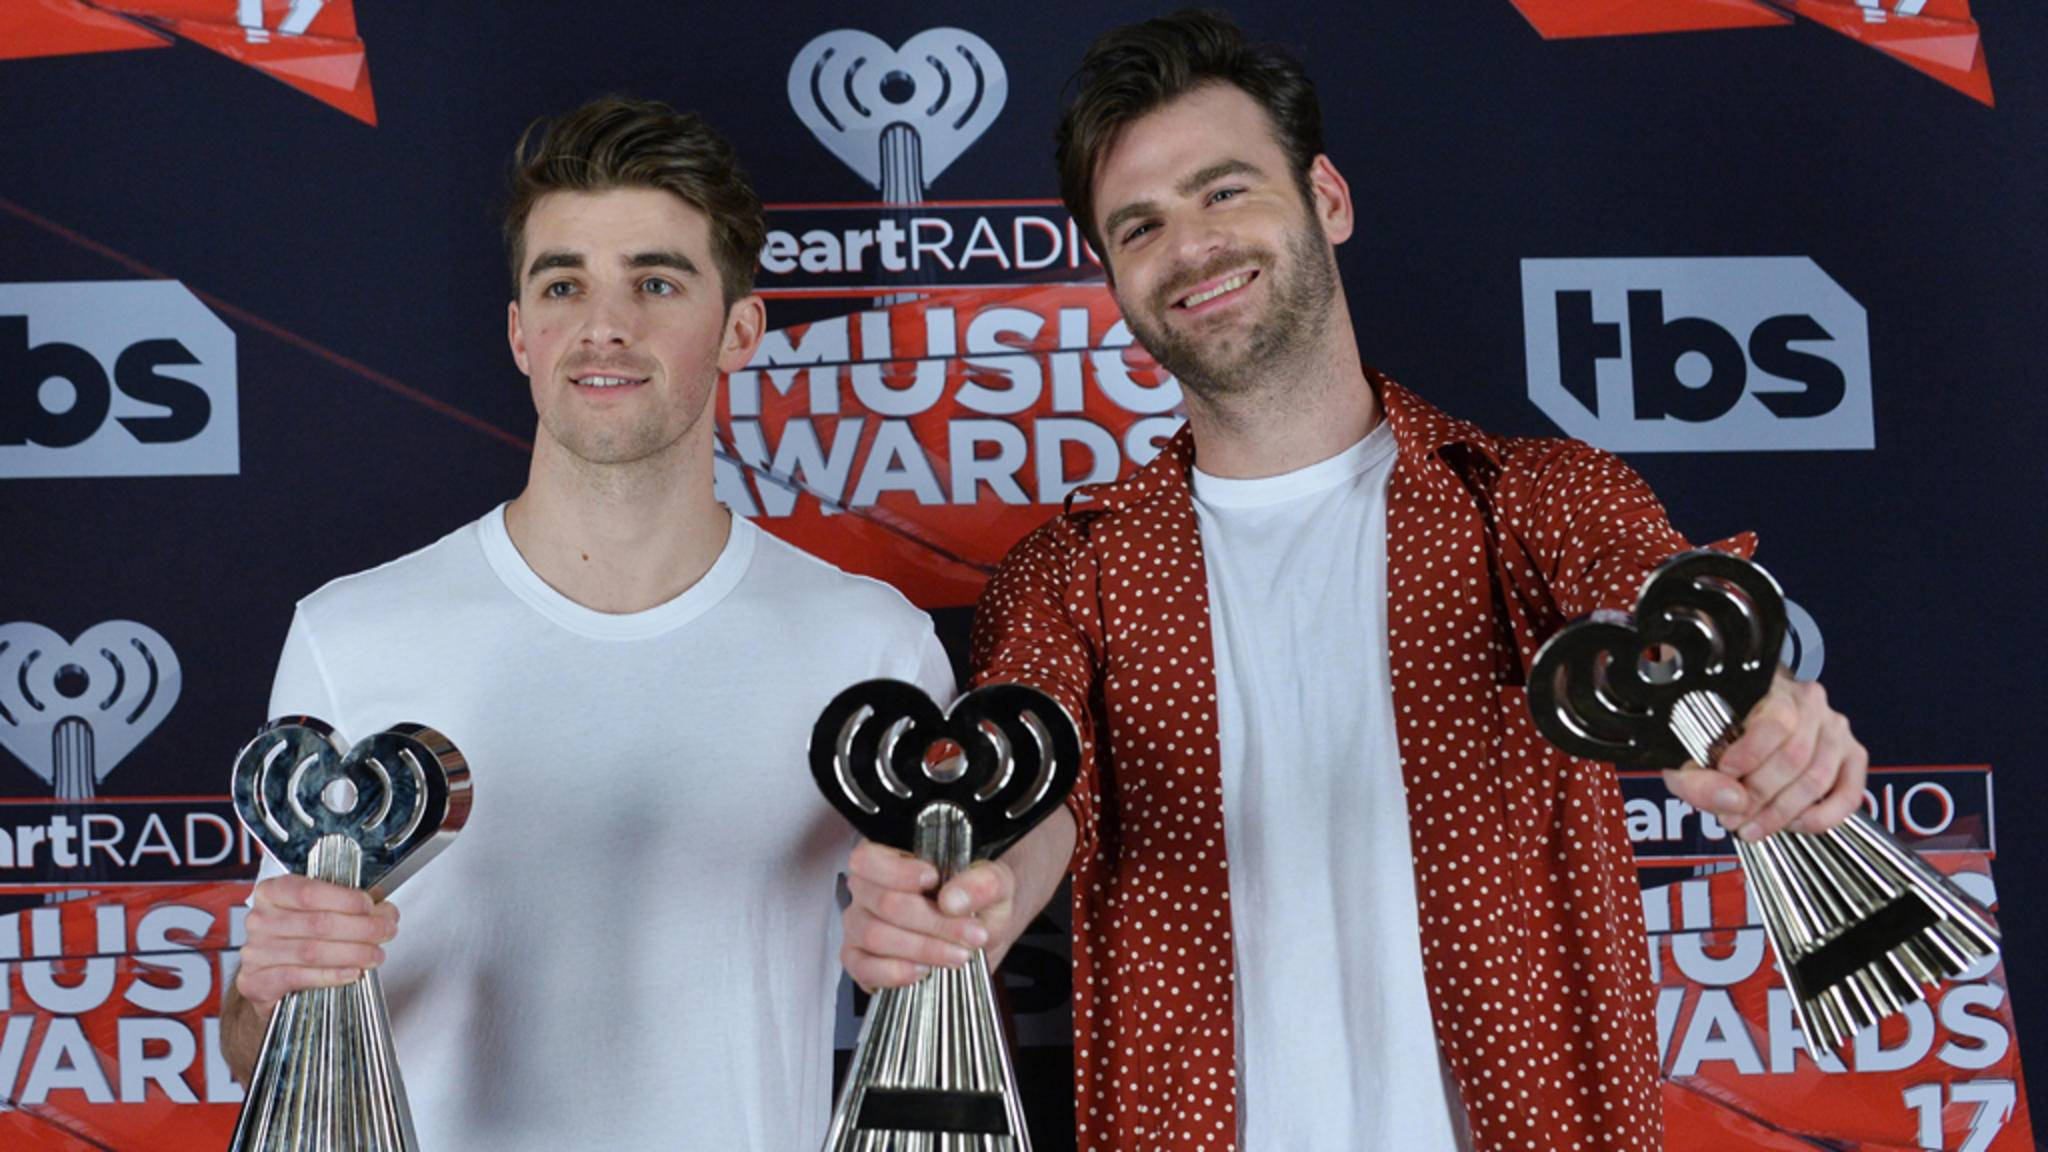 Stolze Gewinner: The Chainsmokers nach den iHeart Radio Music Awards 2017.